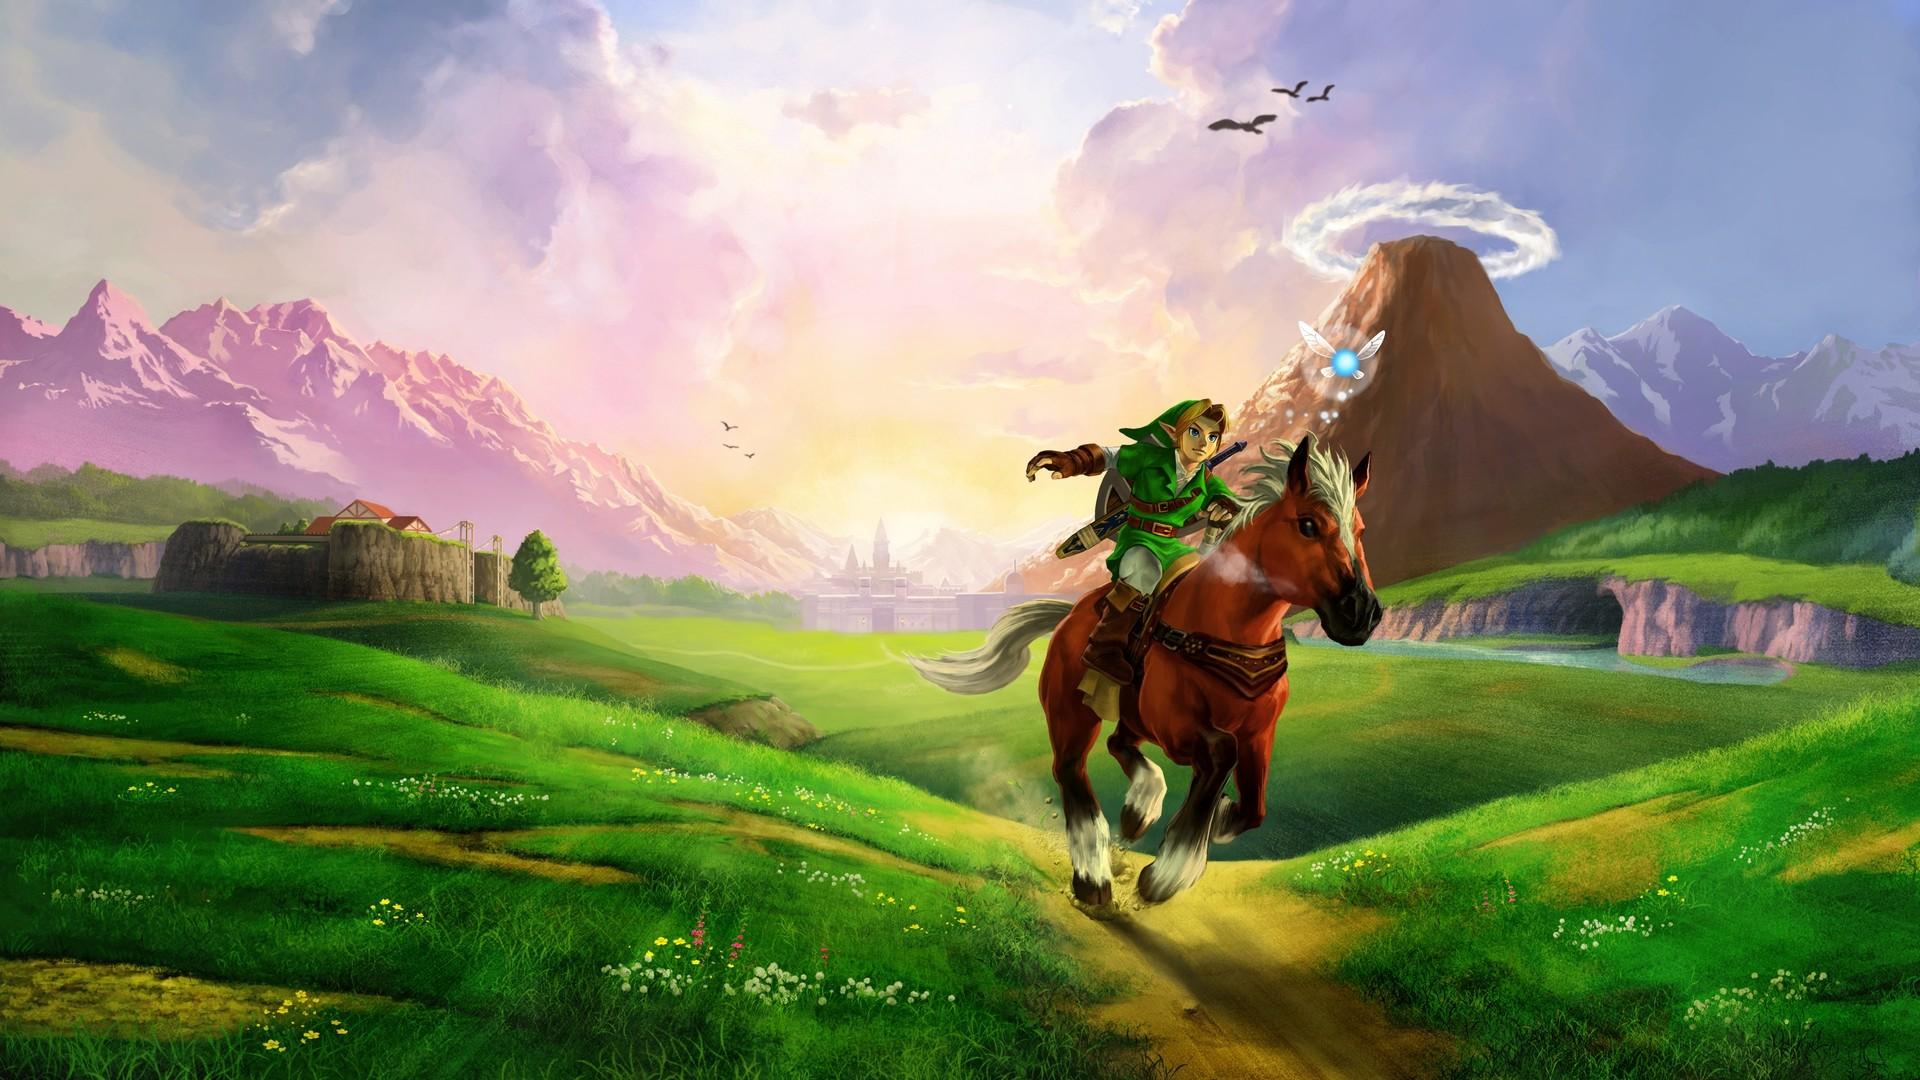 Cool Wallpaper Horse Wall - the_legend_of_zelda_ocarina_of_time_hyrule_field  Trends_374169.jpg